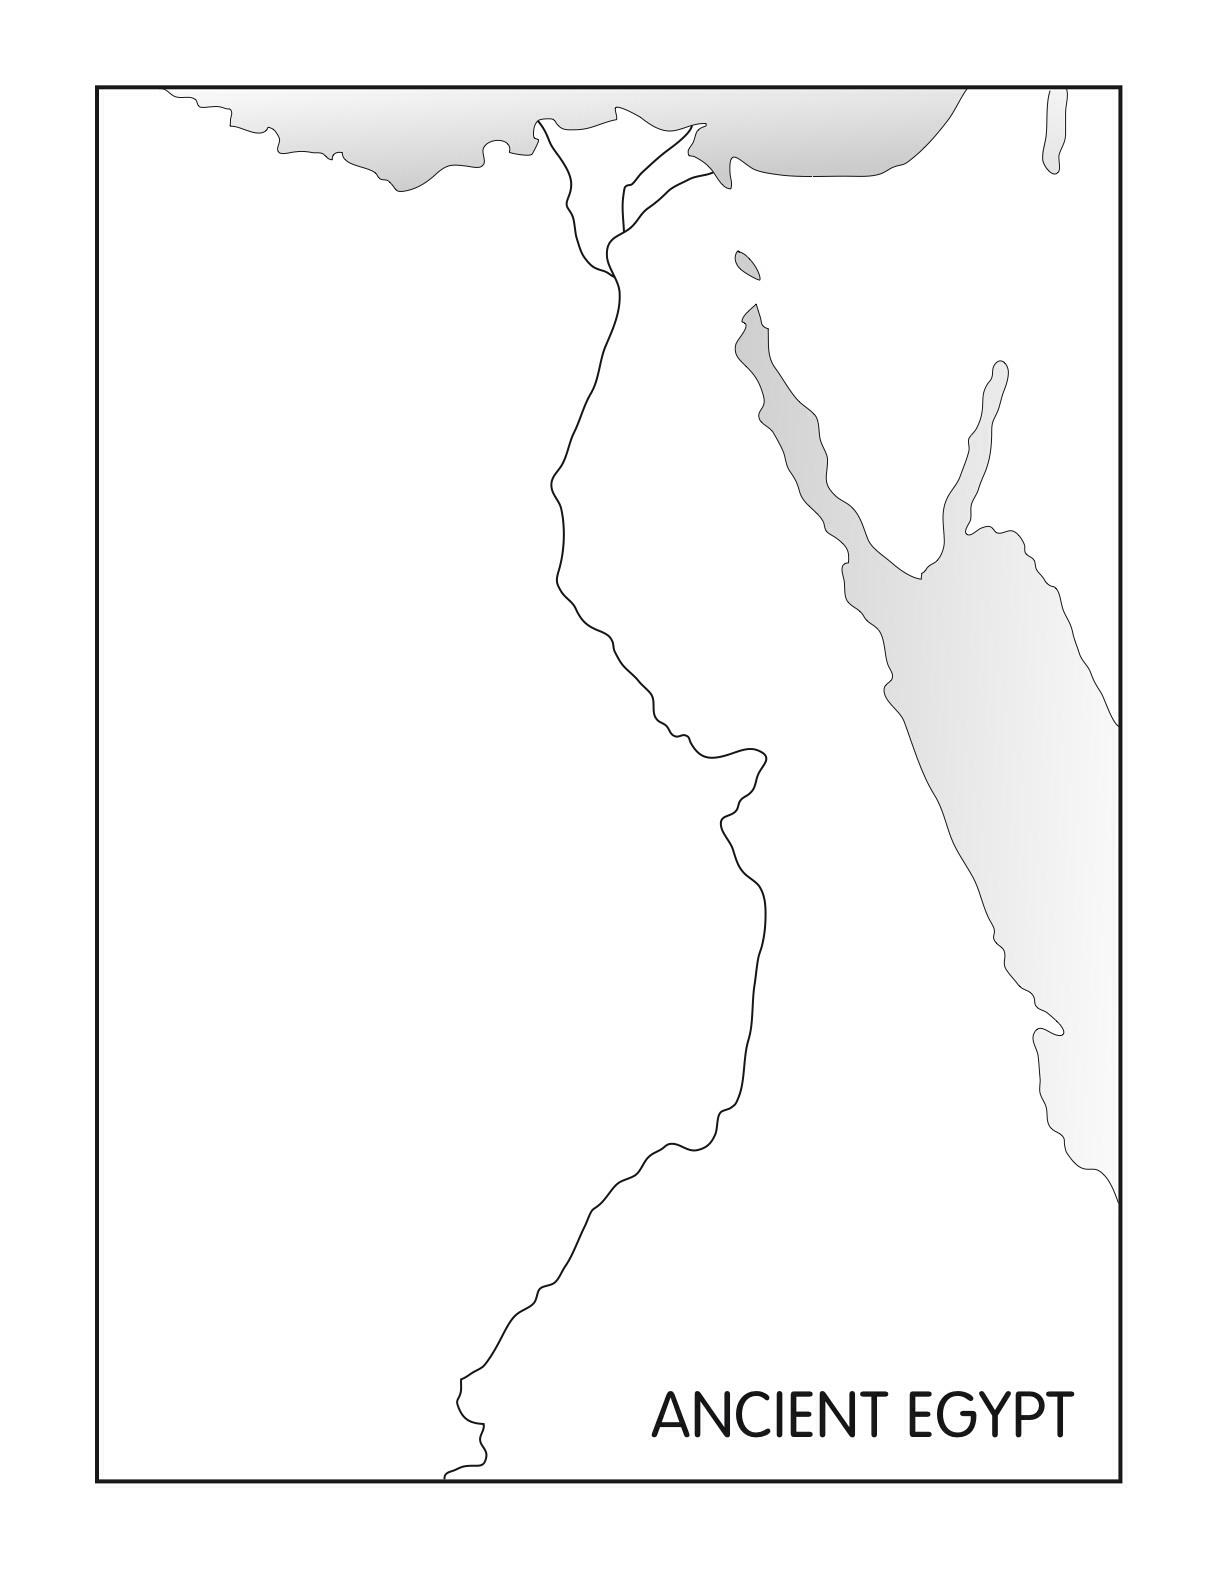 Nile River Nubian Desert Mediterranean Sea Libyan Dese